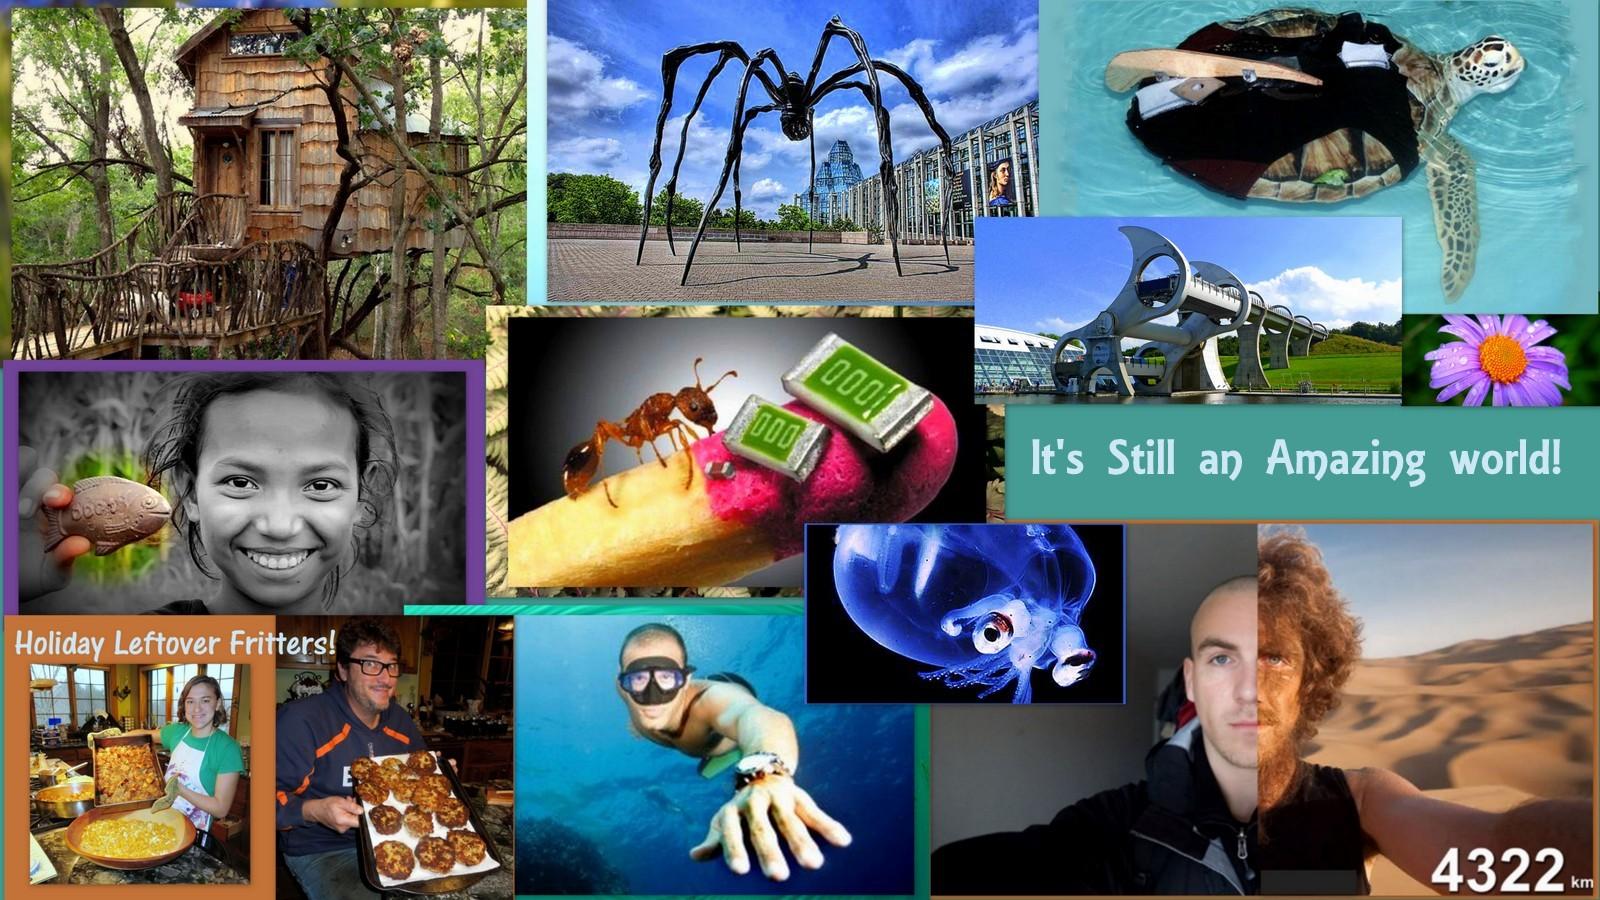 Image: EWC Photo collage It's still an amazing World